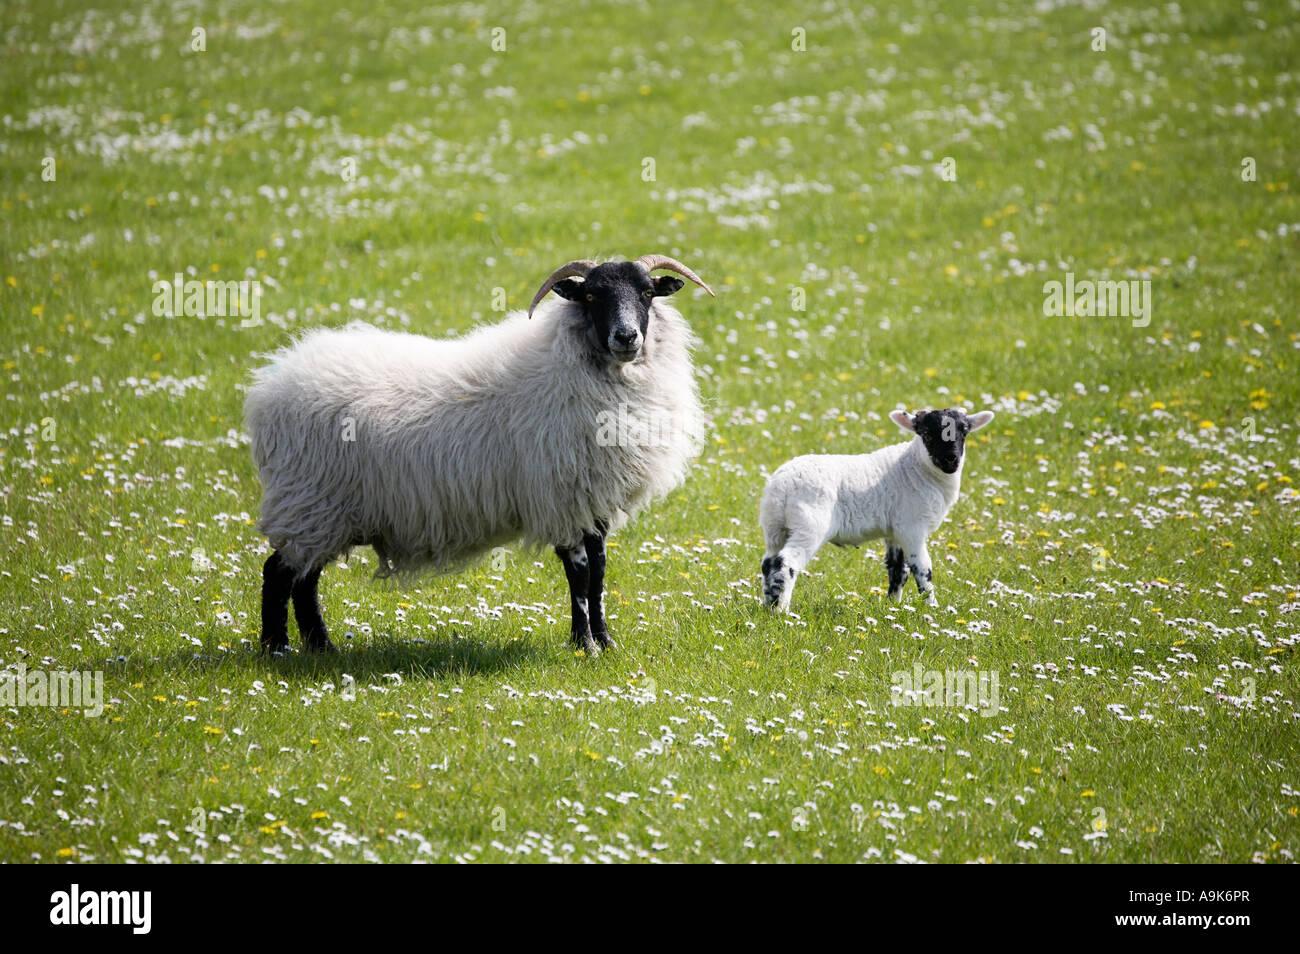 scottish blackface sheep ewe and lamb stock photo royalty